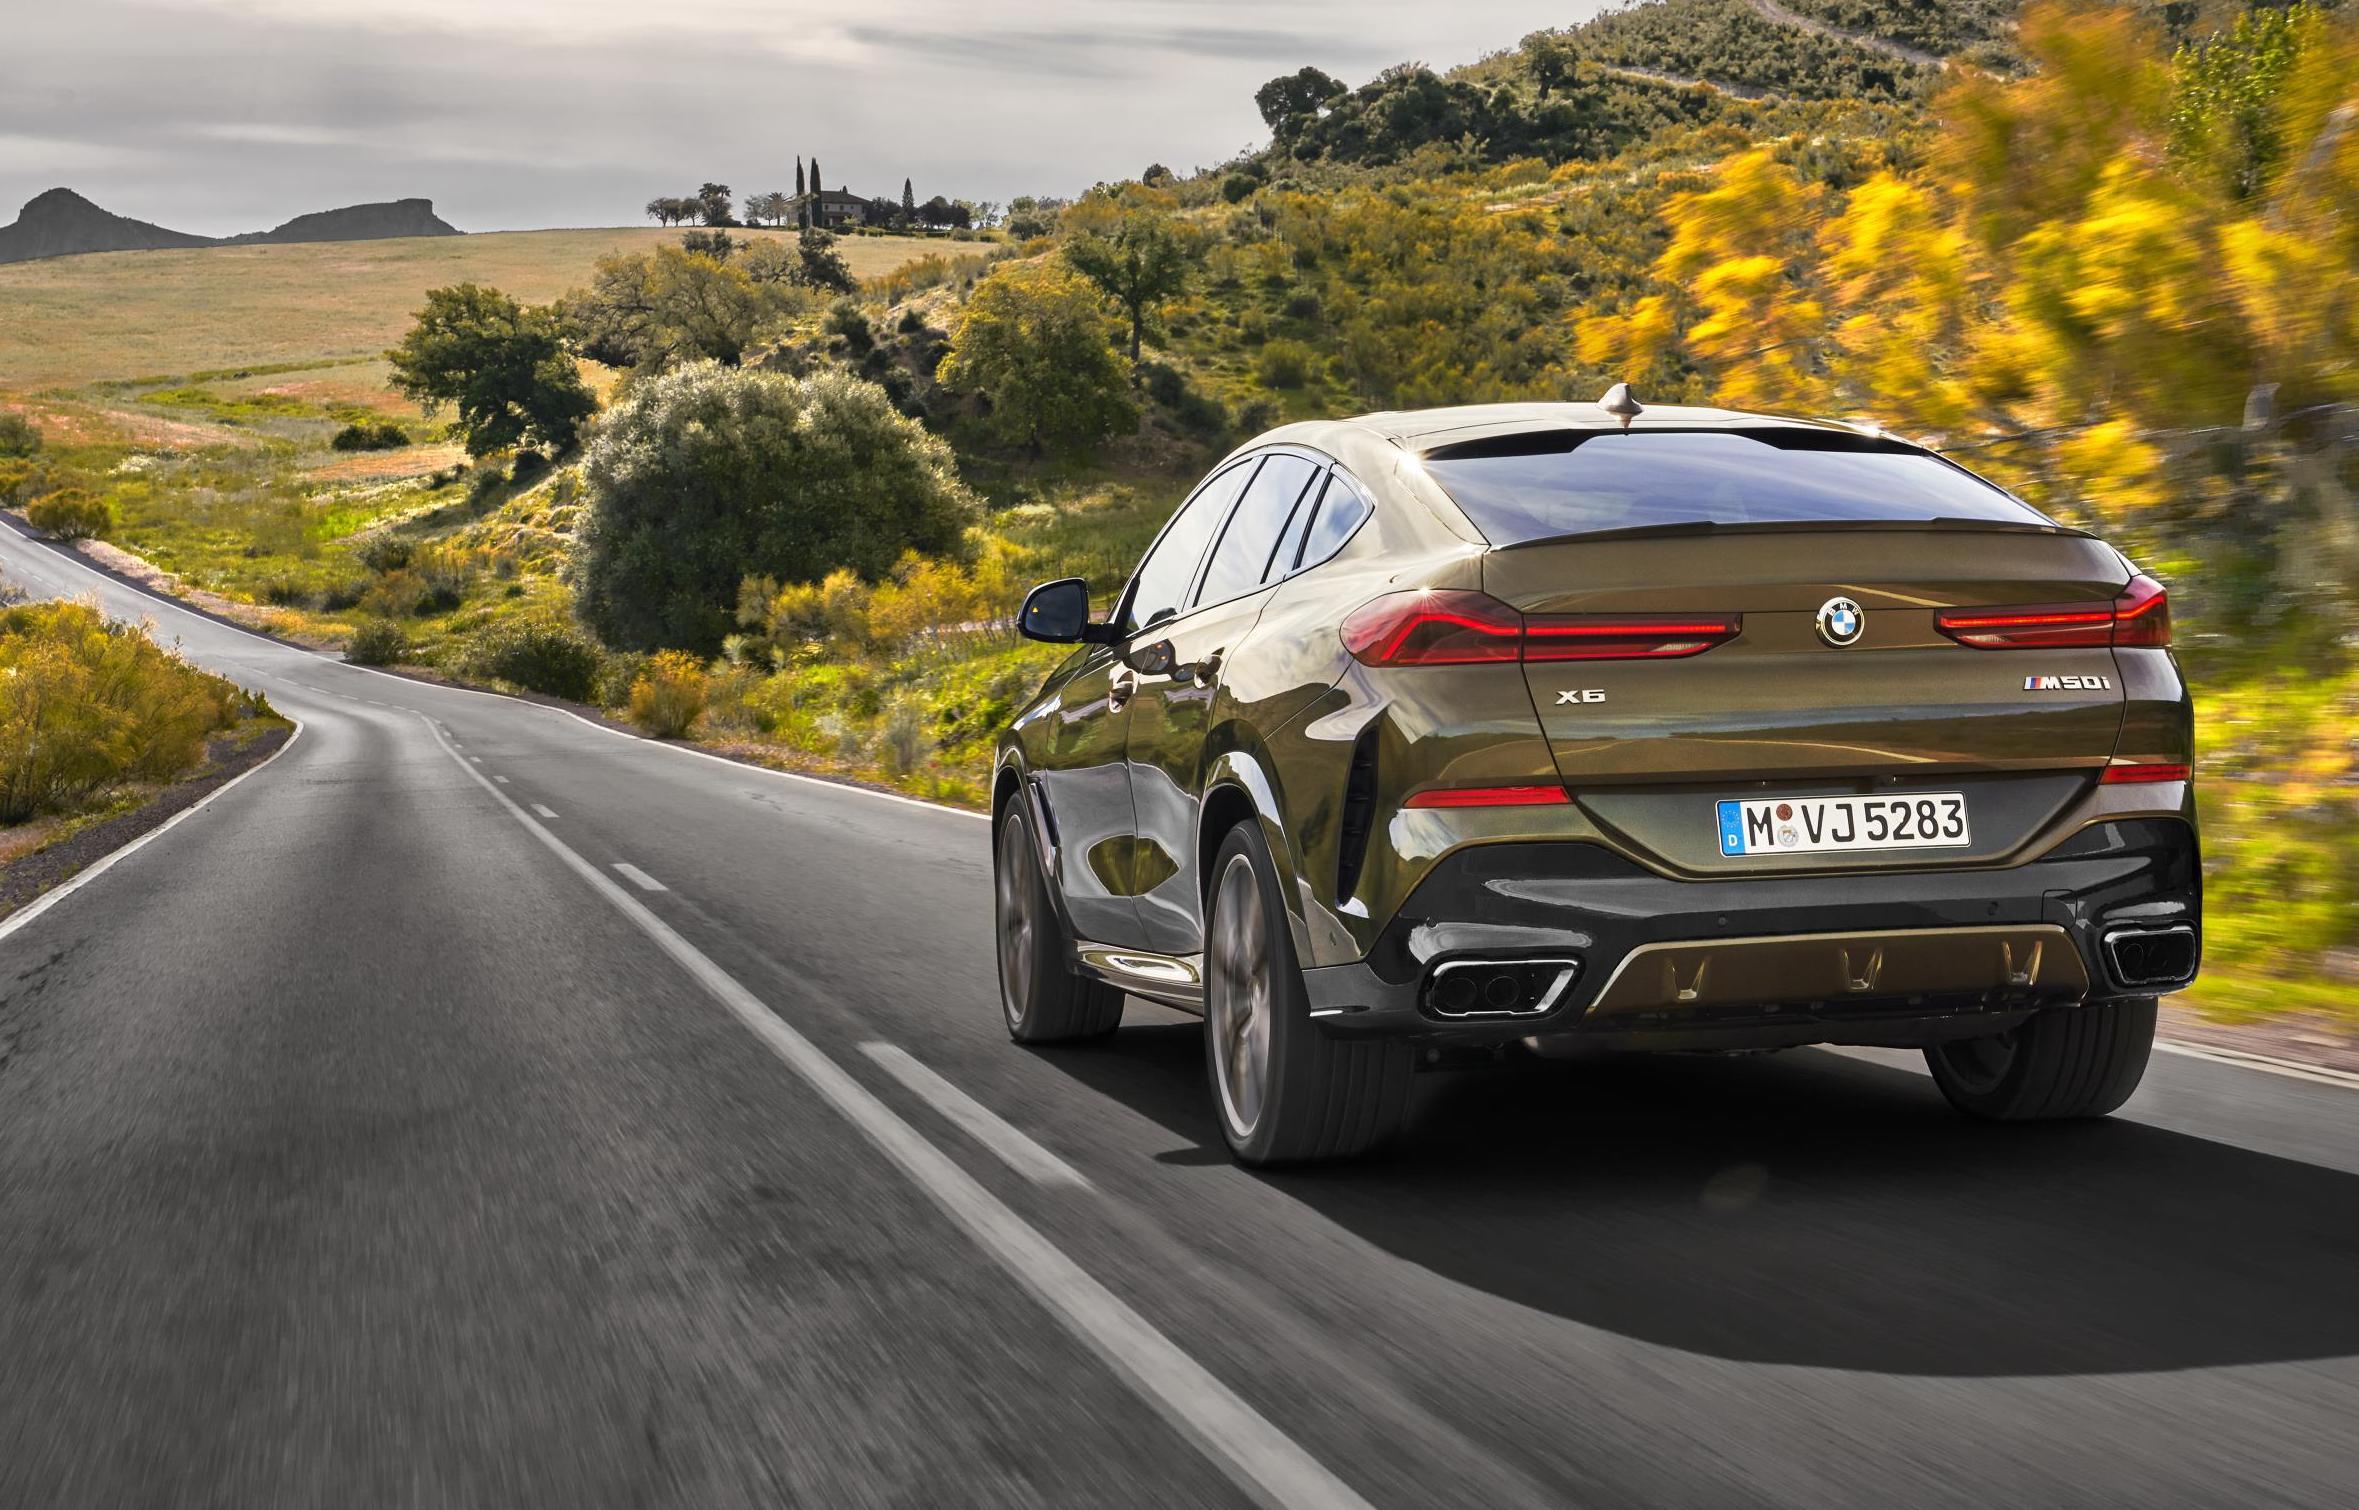 2020 Bmw X6 Details Confirmed For Australia Performancedrive